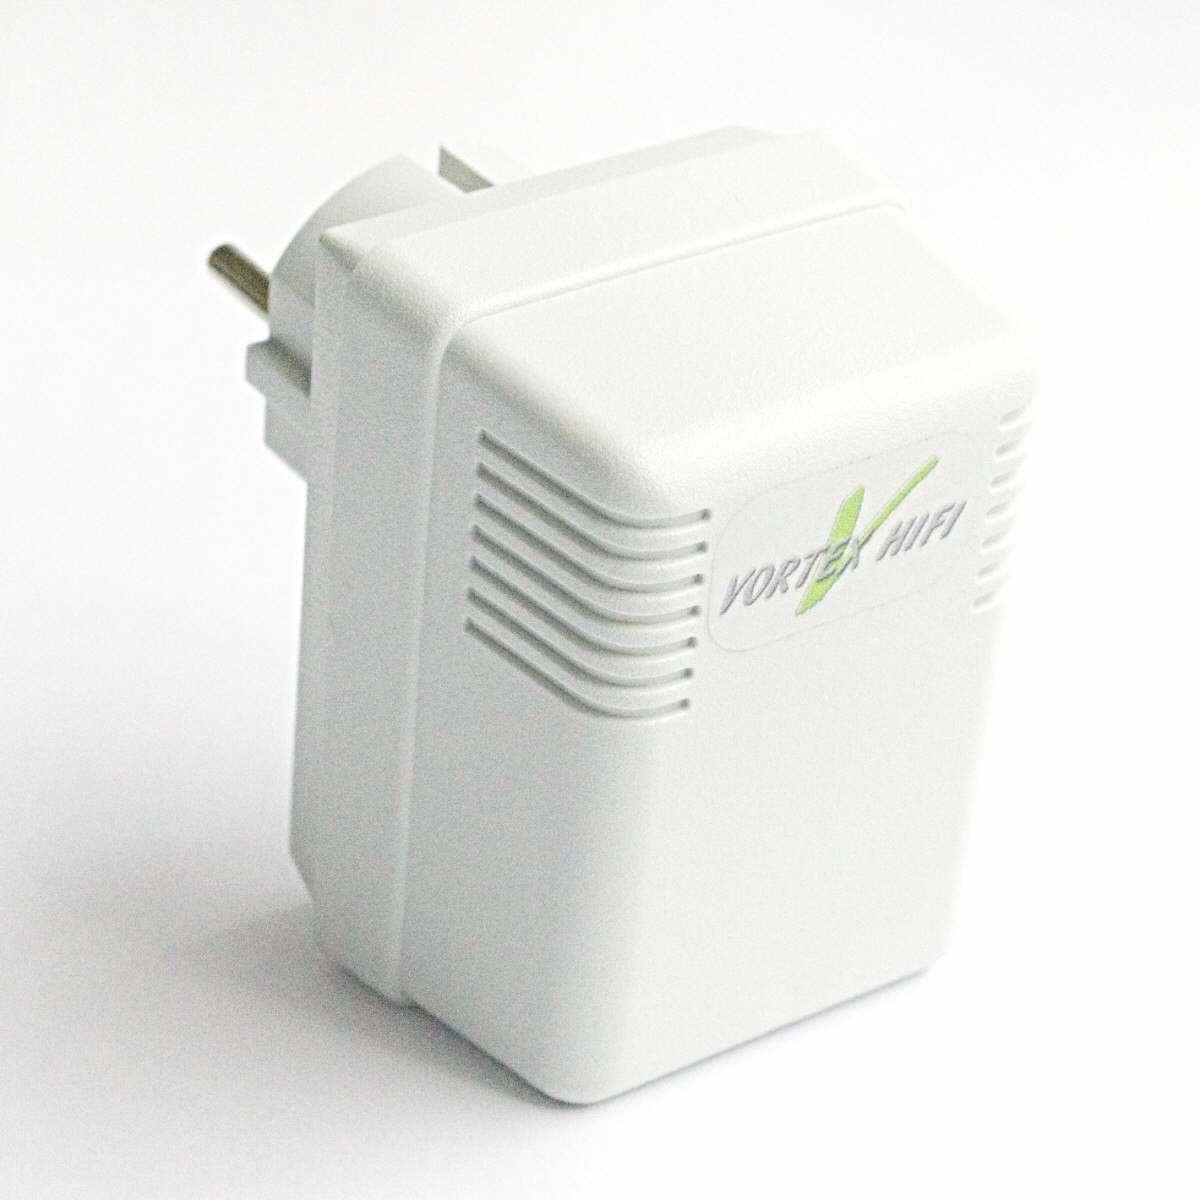 Vortex Hifi Power Optimizer Light